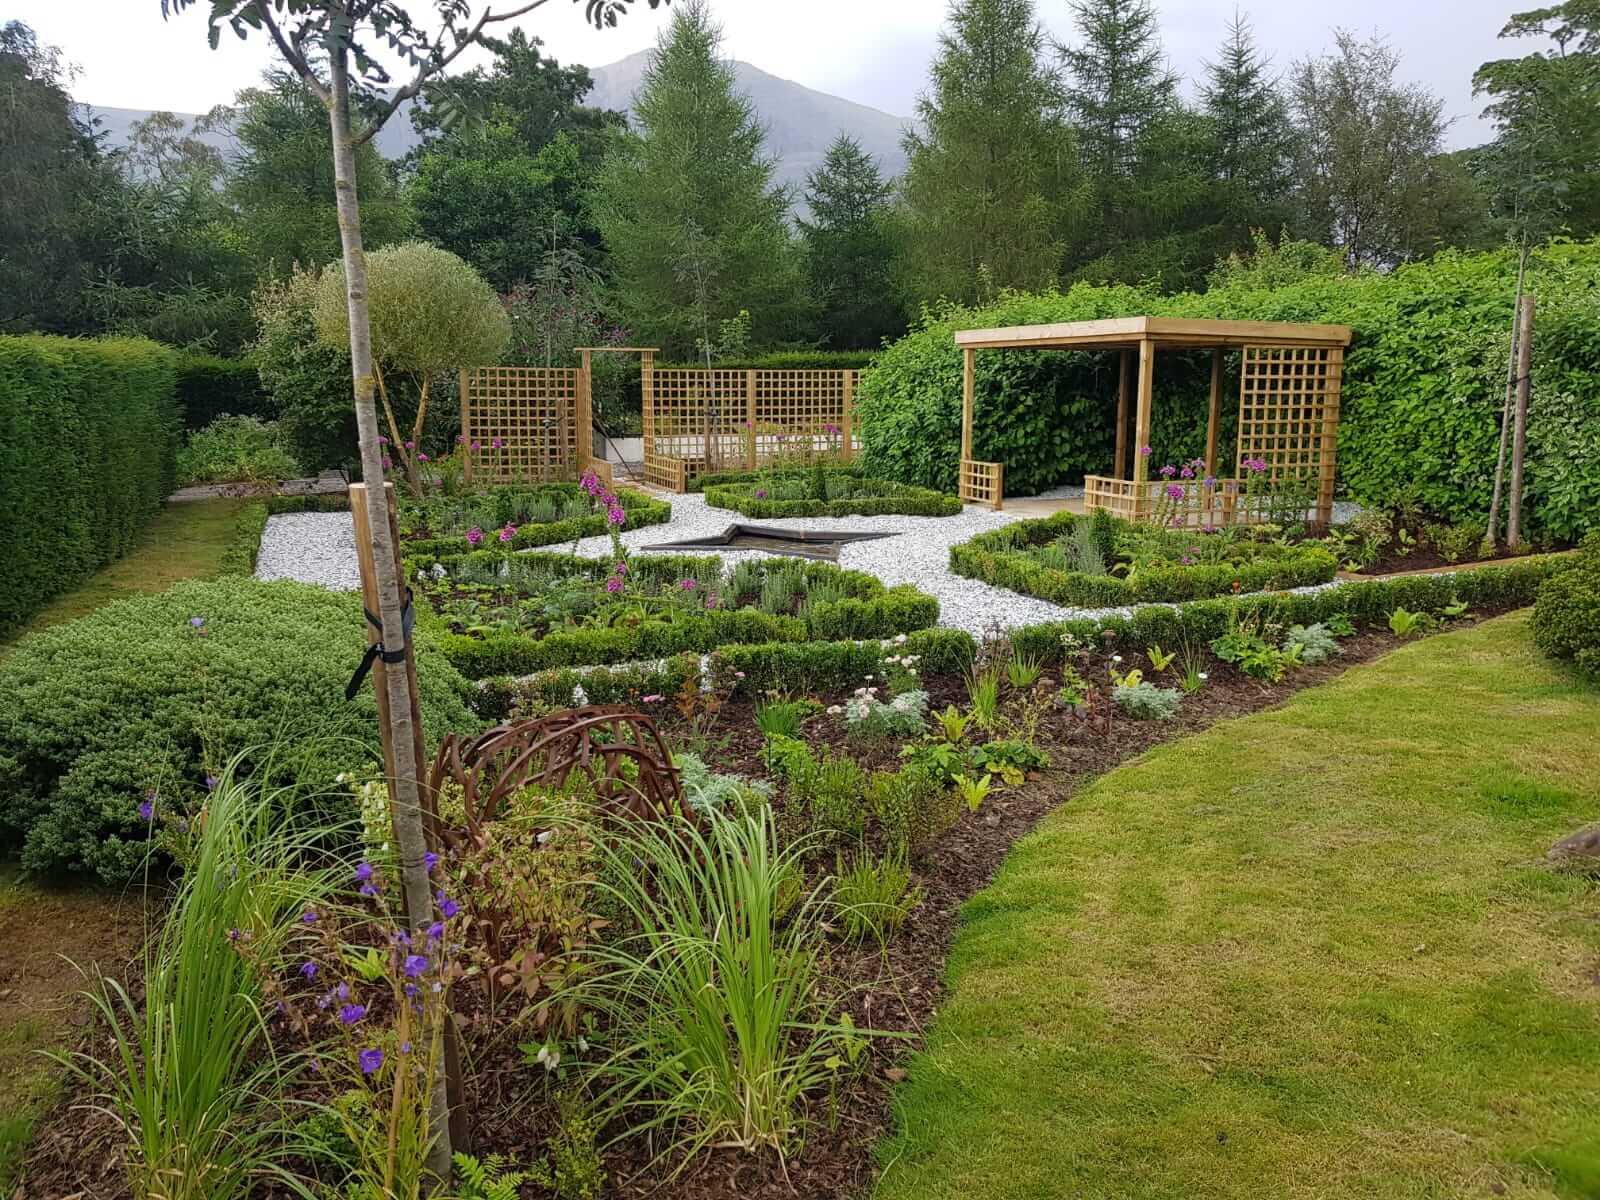 Johnsons' plants make a scenic trip to 5-star luxury Scottish Highland Hotel